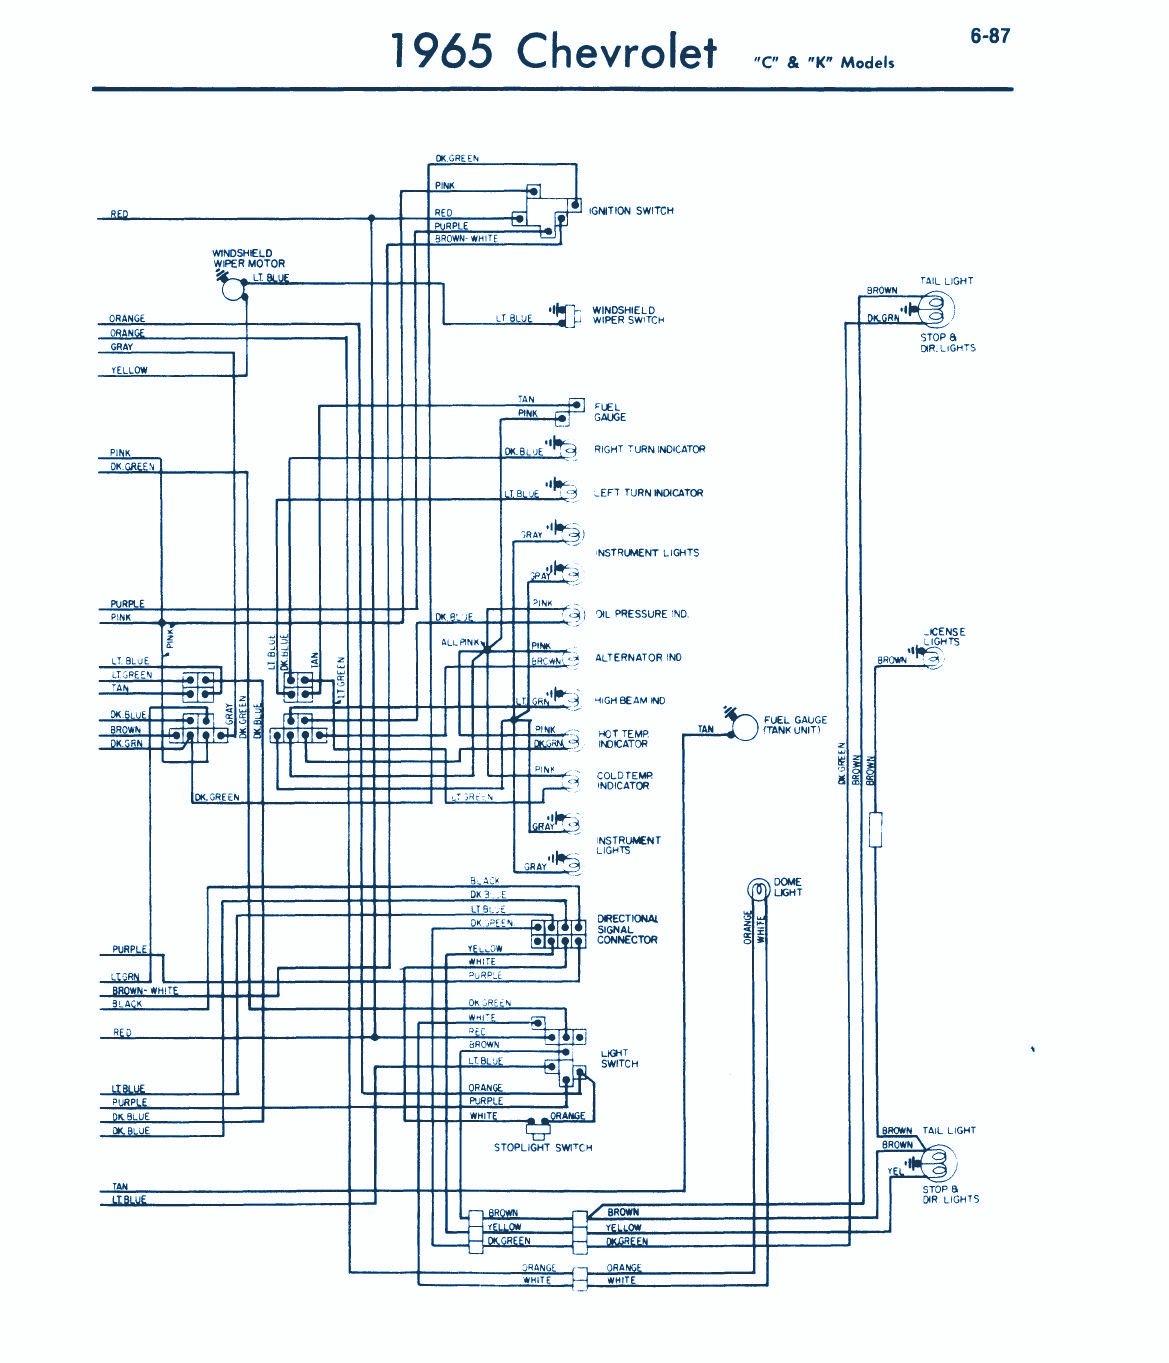 1965 Chevrolet Wiring Diagram   Auto Wiring Diagrams